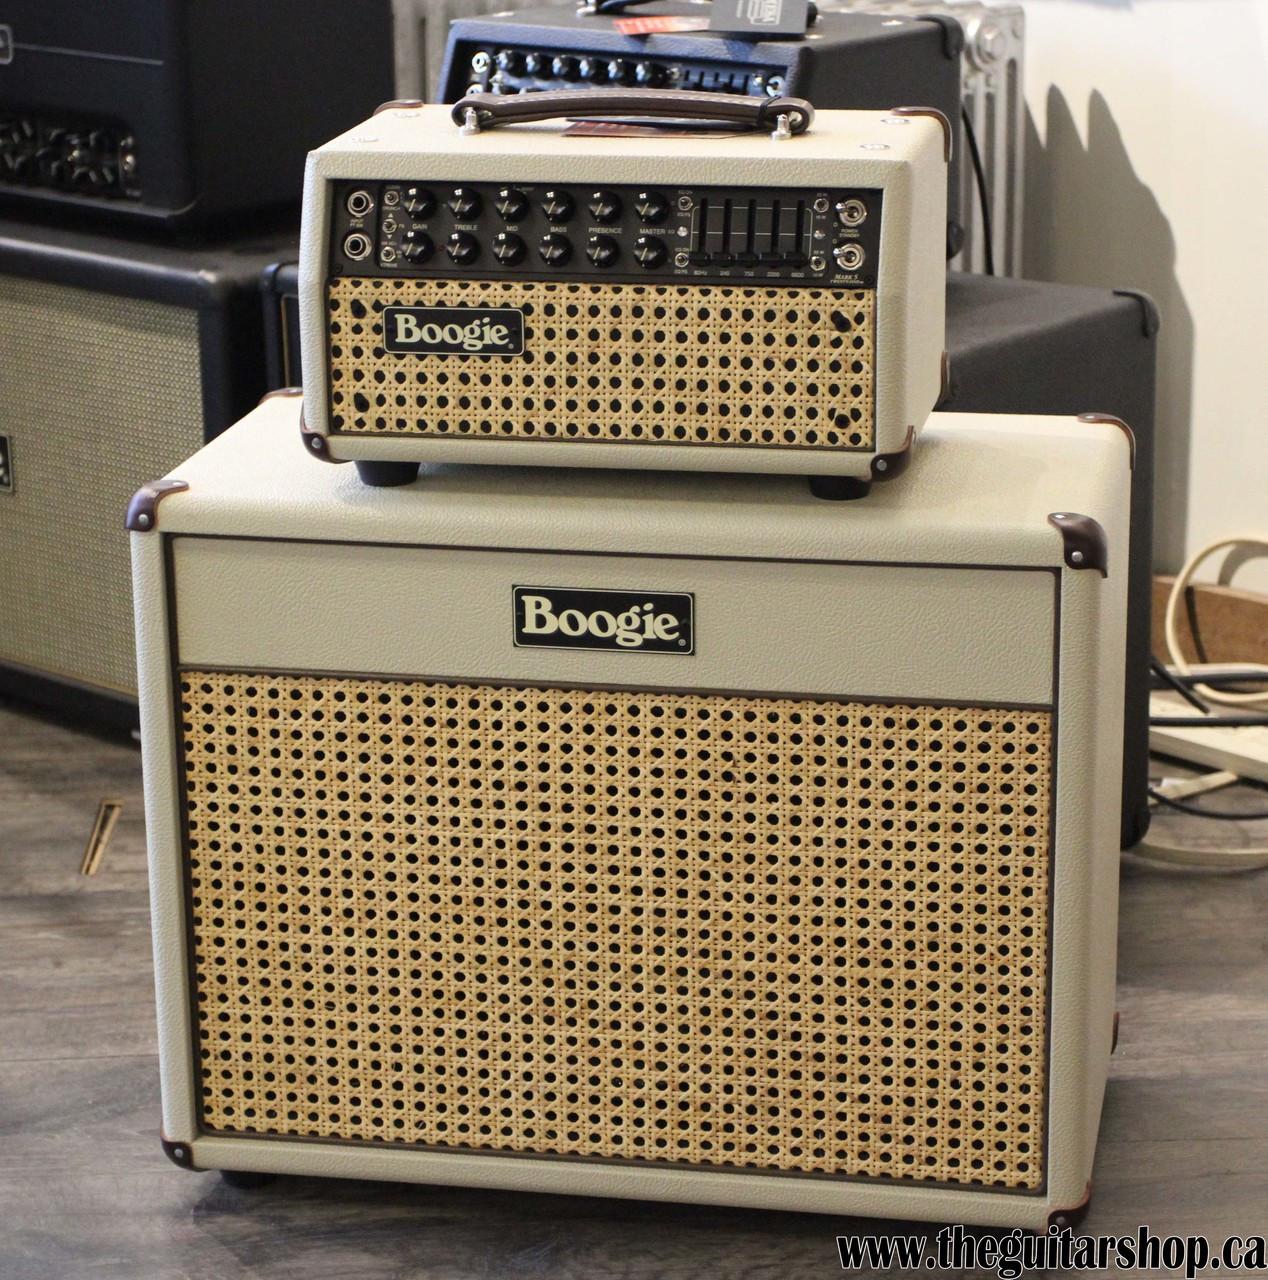 Mesa Boogie Mark 5 : mesa boogie custom mark v 25 and lonestar 23 set cream bronco the guitar shop 905 274 5555 ~ Russianpoet.info Haus und Dekorationen